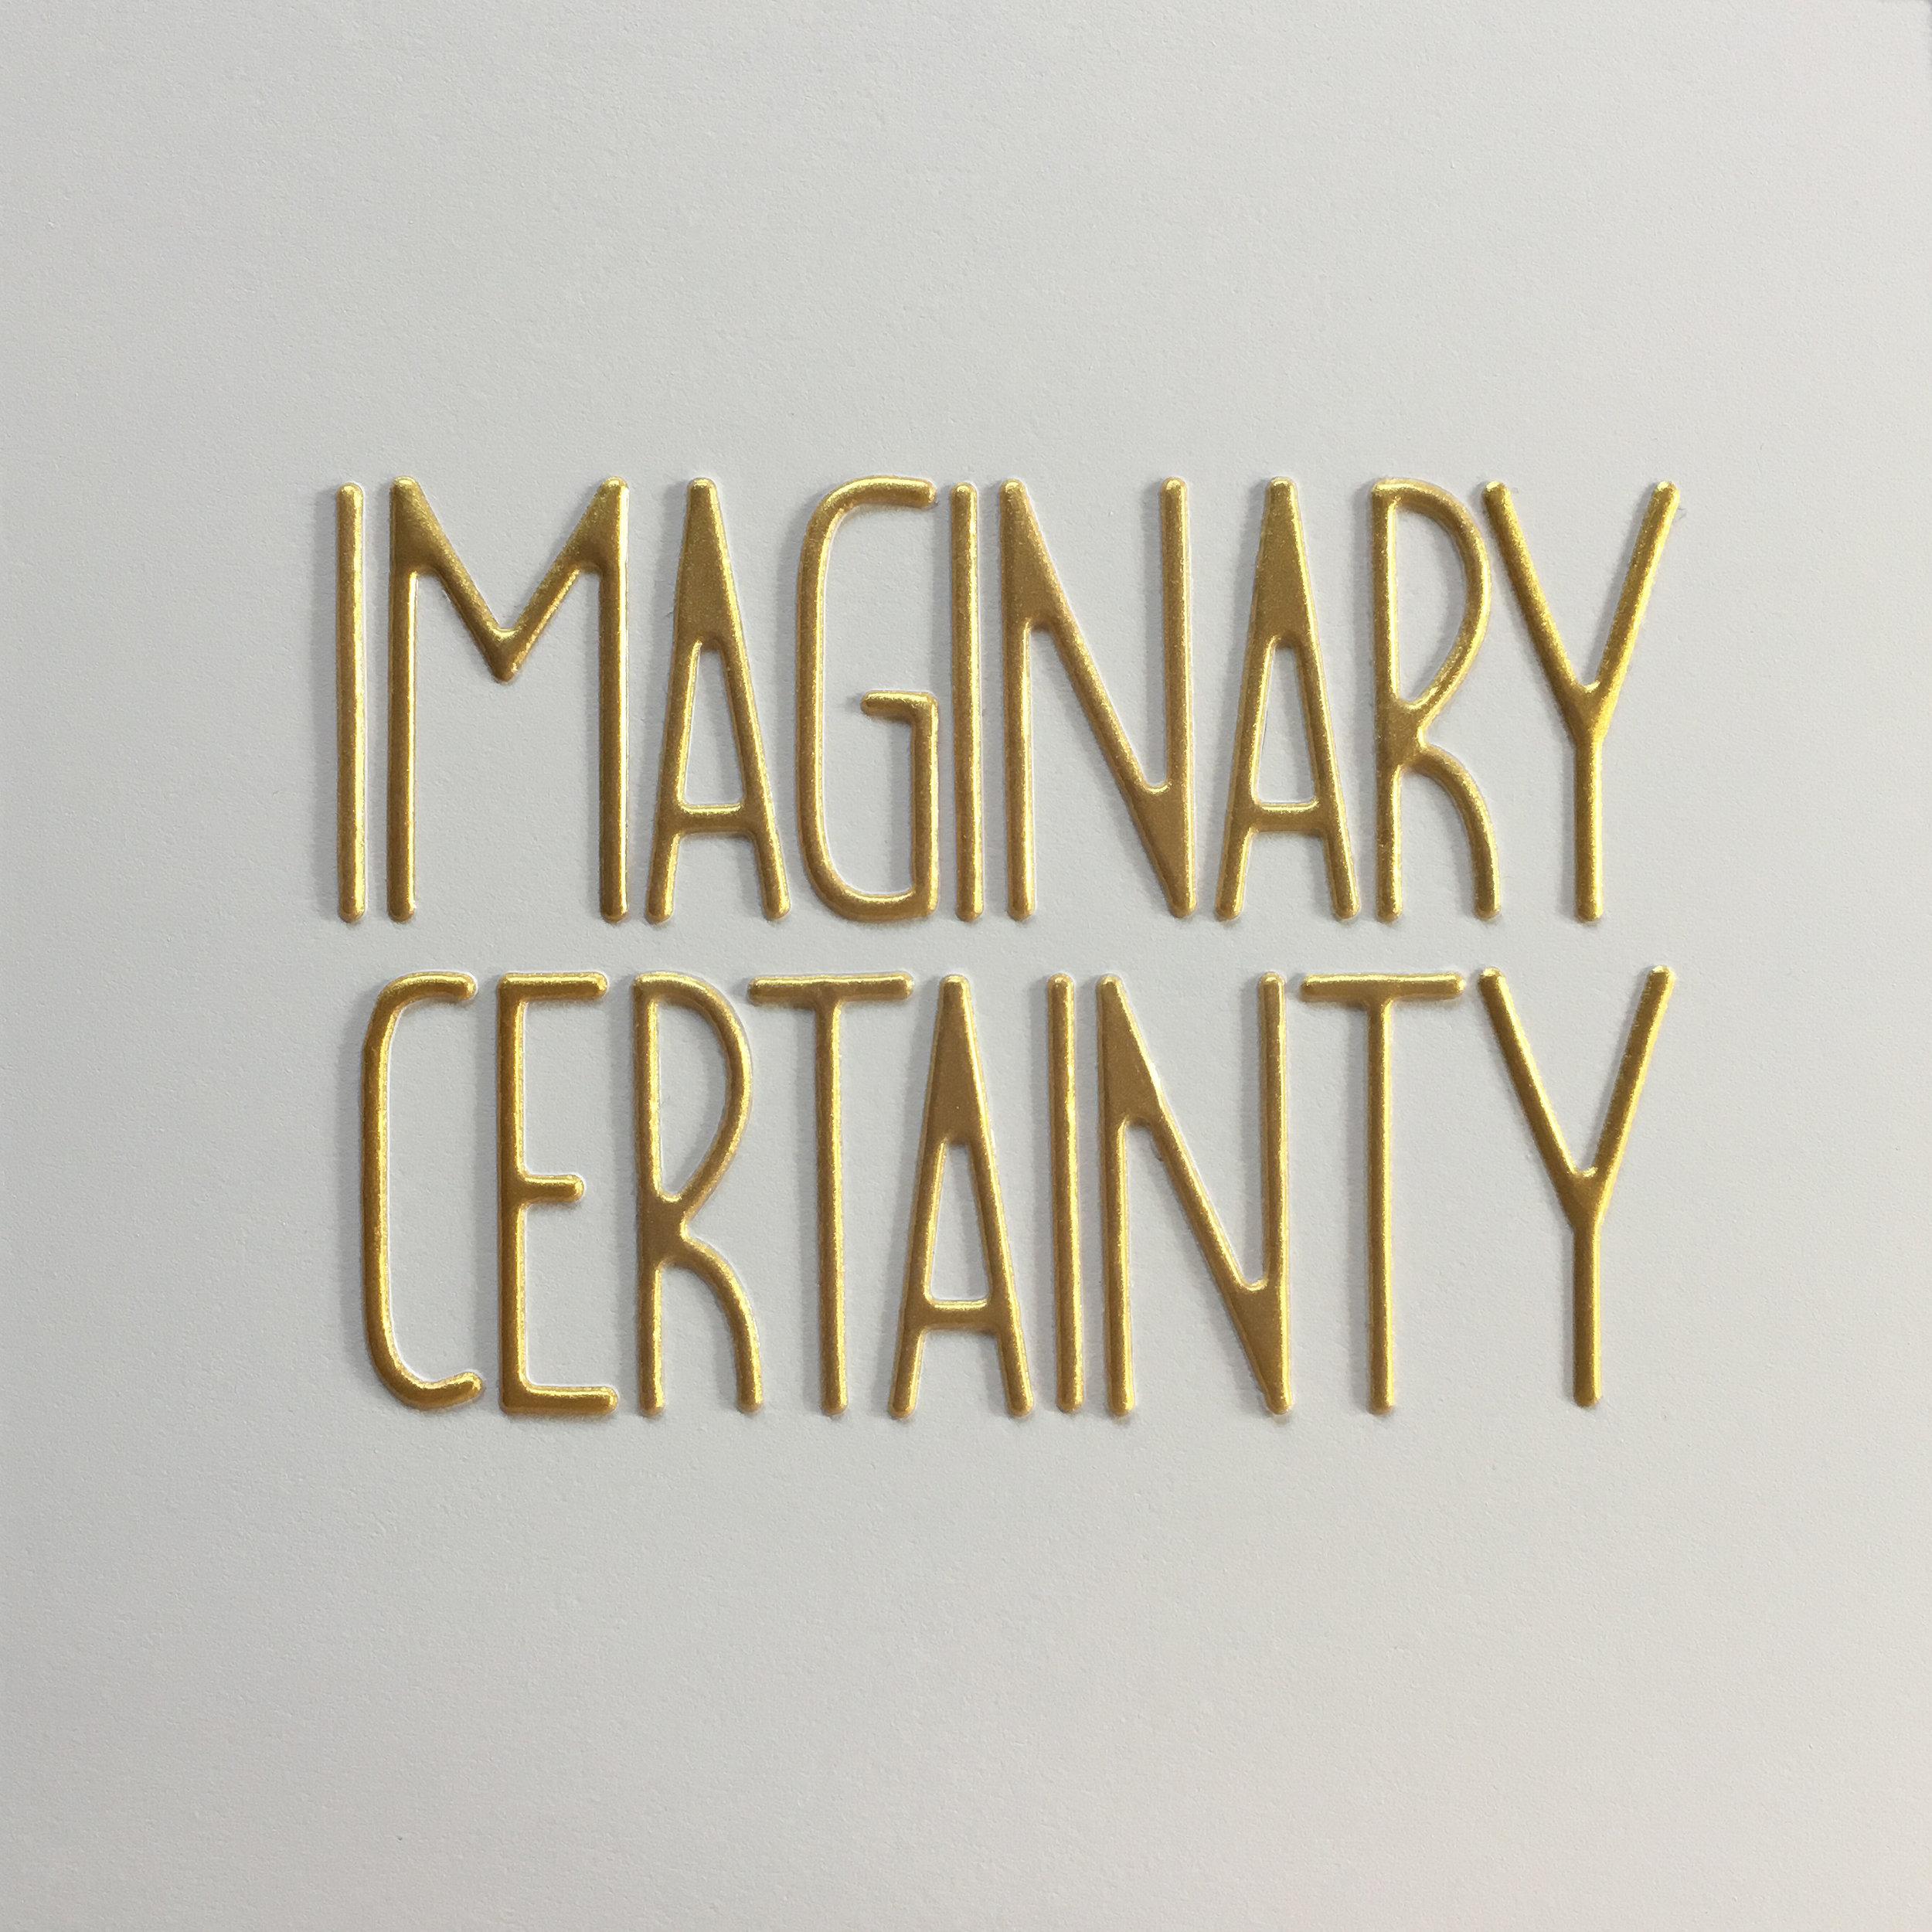 imaginary certainty.jpg